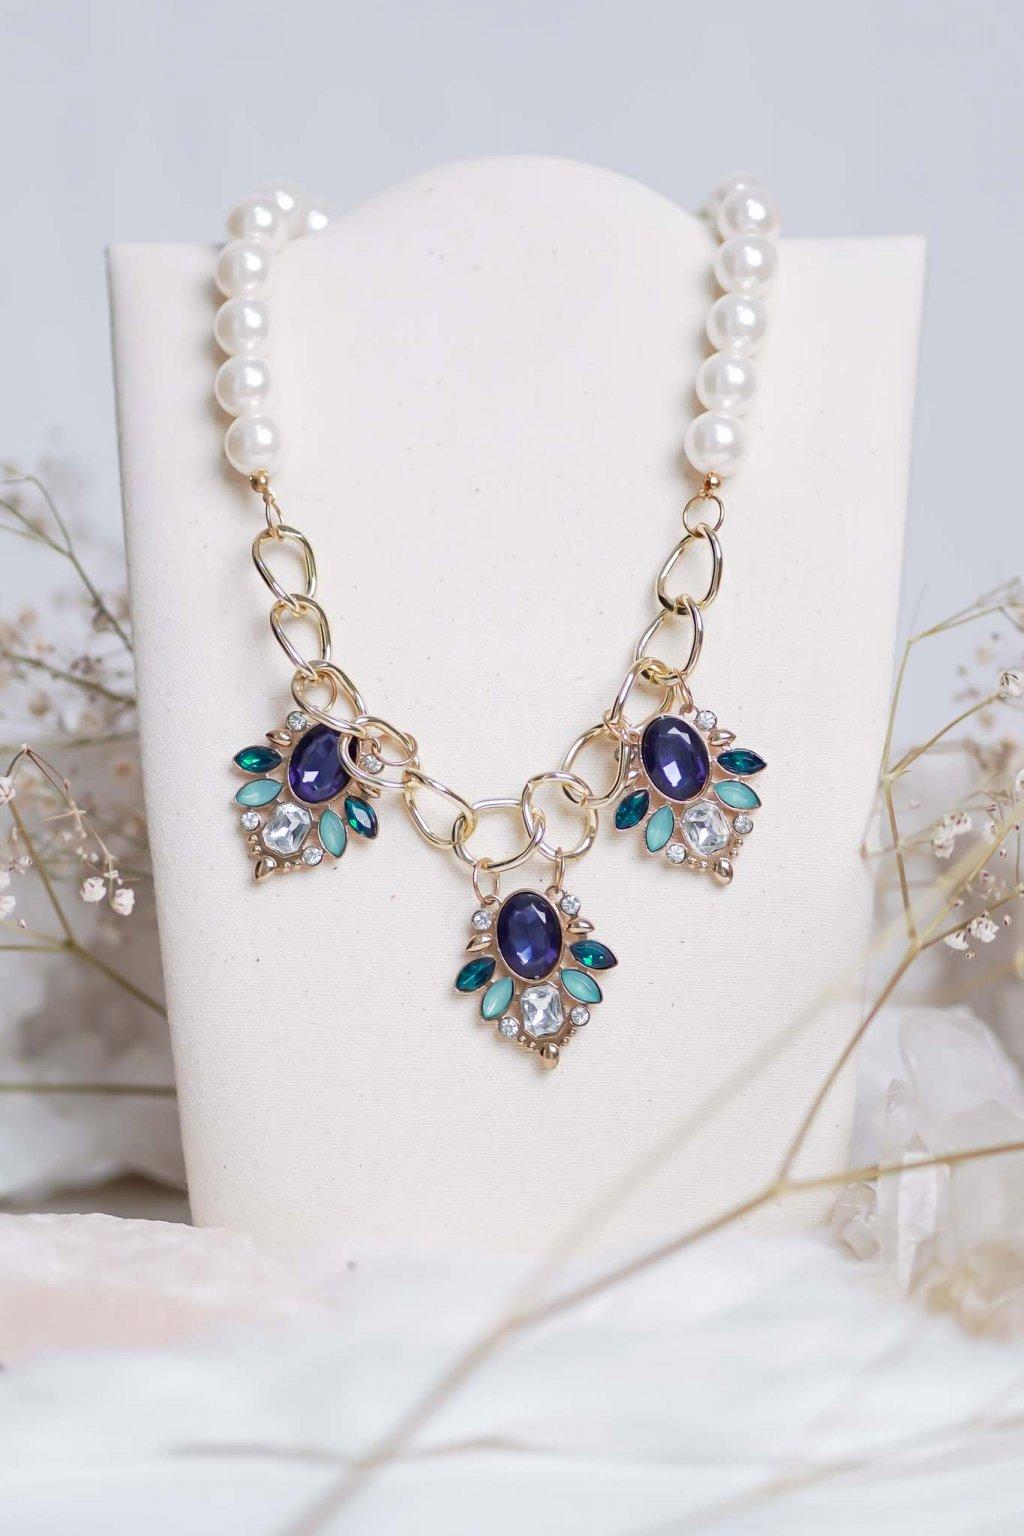 náhrdelník, šperk, spoločenská náhrdelník, náhrdelník na bežný deň, výrazný náhrdelník, jemný náhrdelník, šperky, náhrdelník na ples, svadbu, stužkovú 16